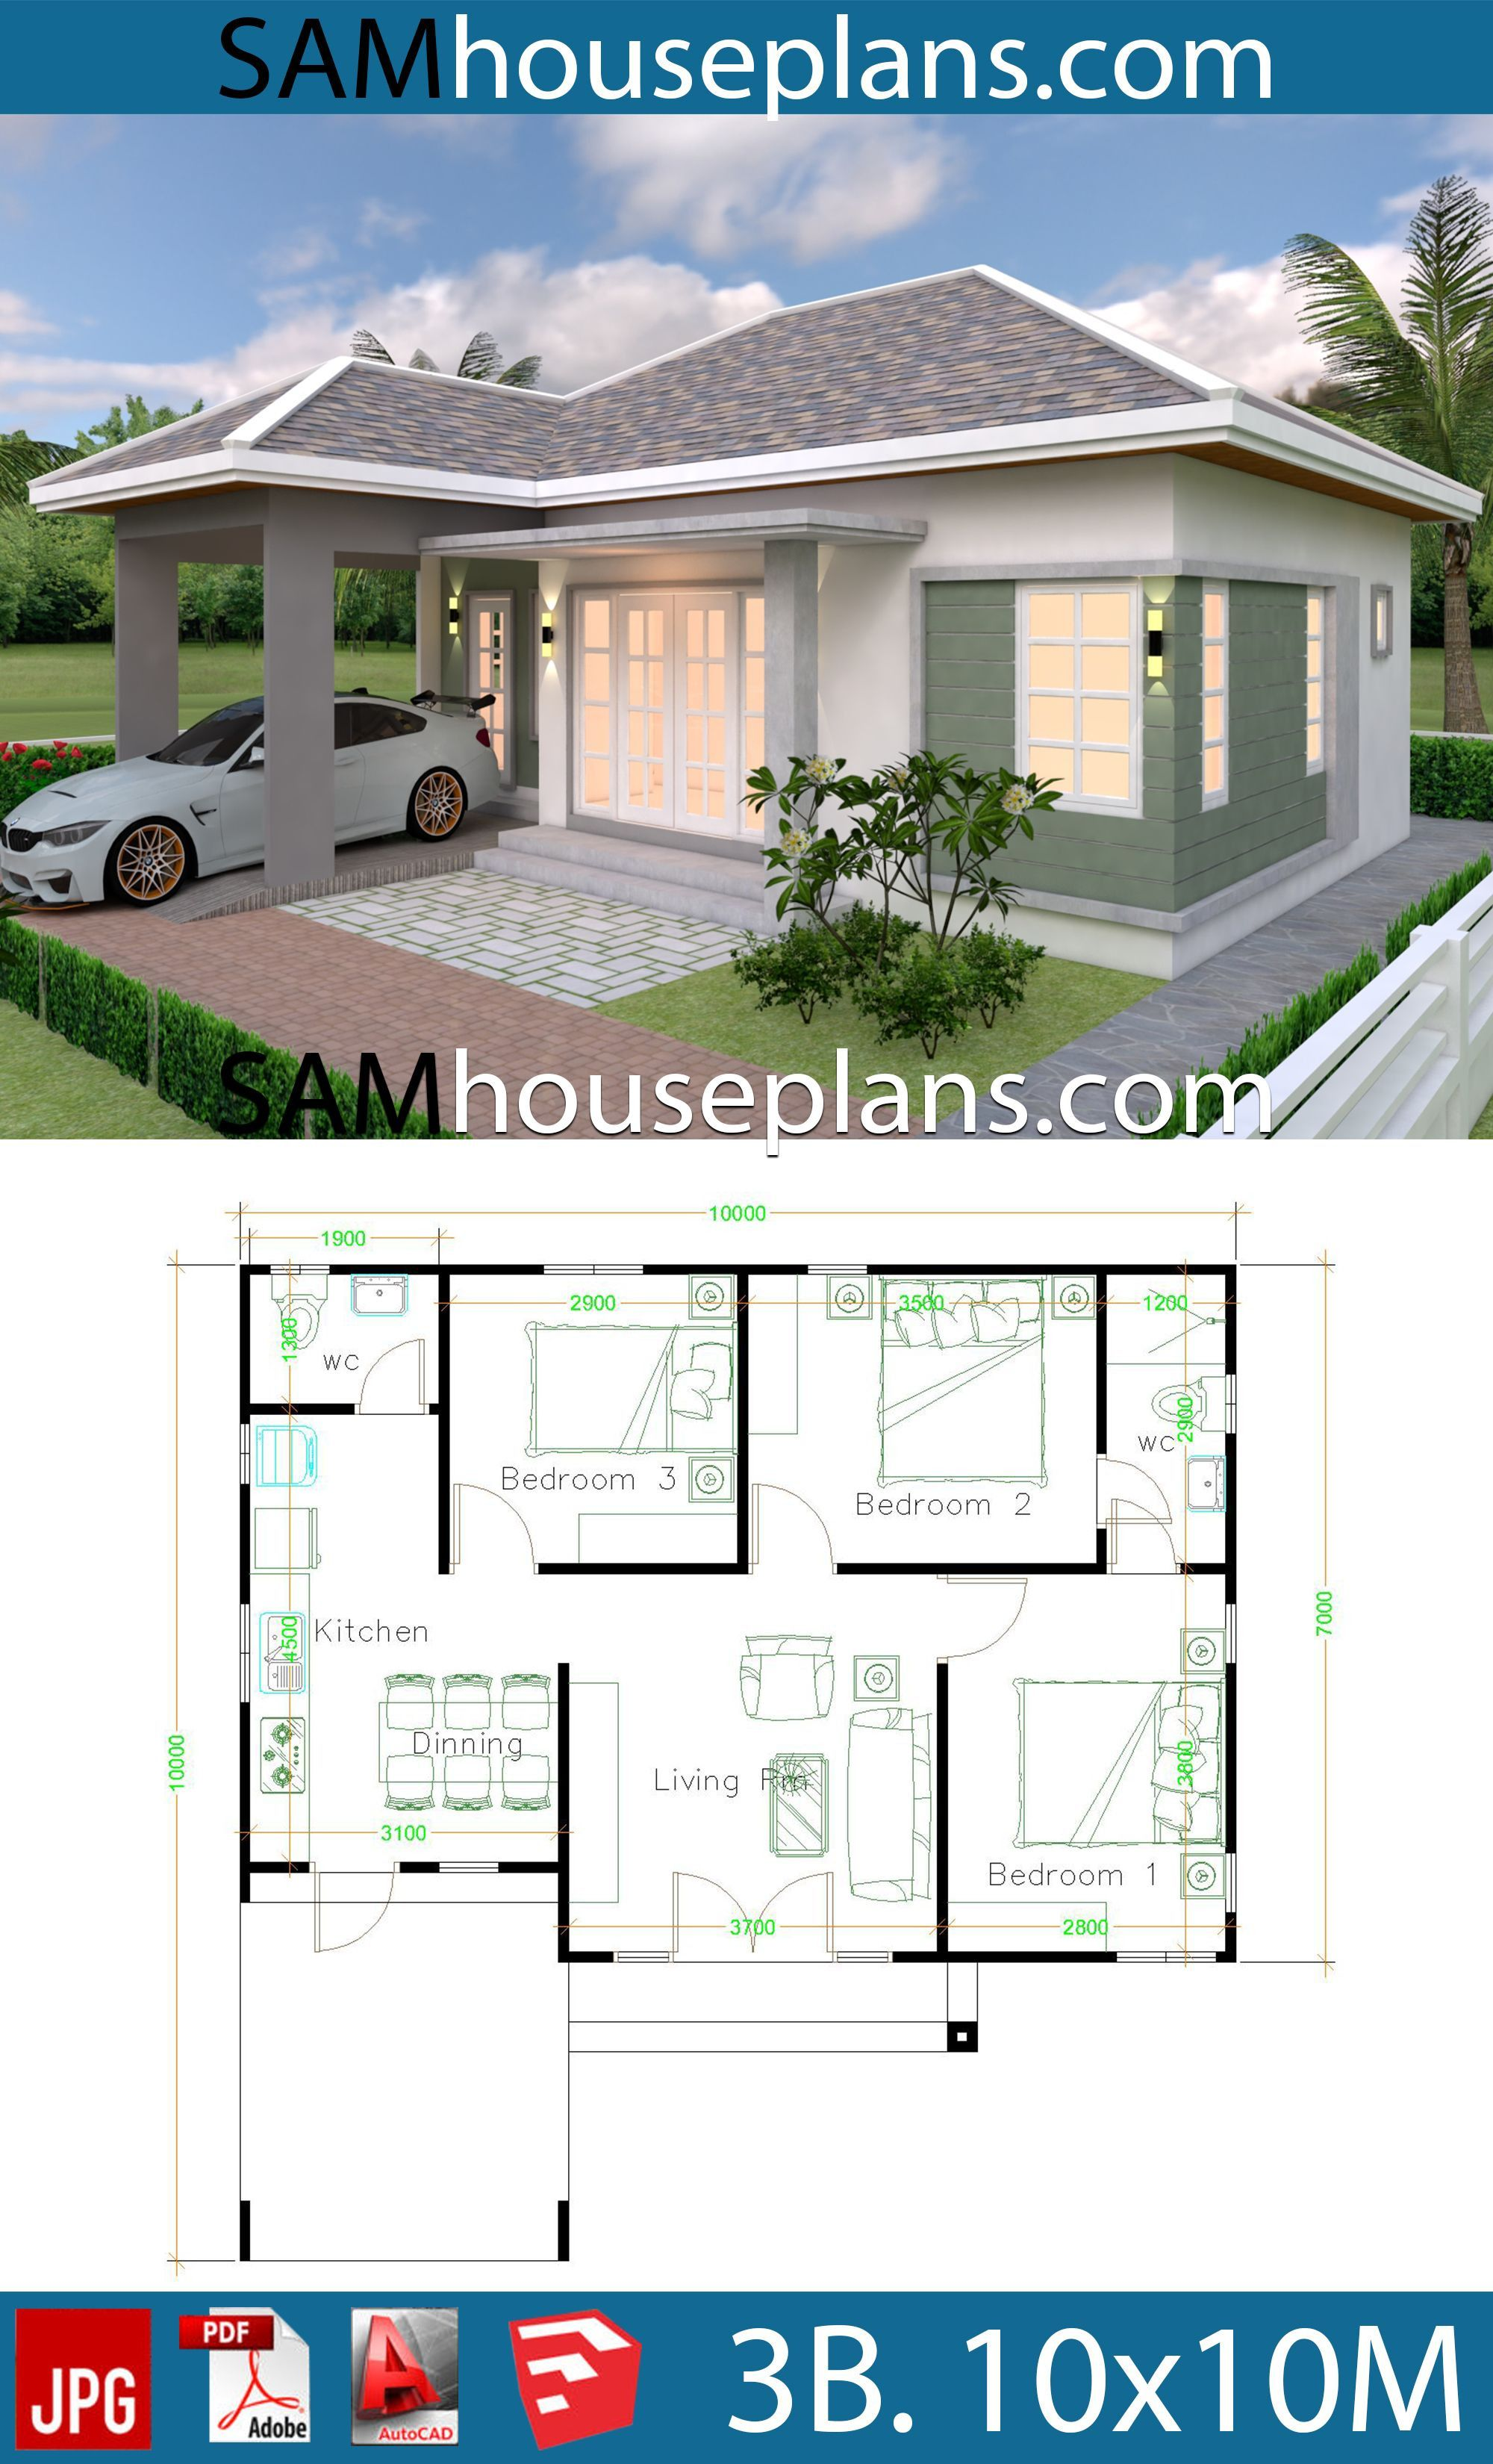 House Building Plans Free Download 2021 Architectural House Plans Sims House Plans Small House Design Plans